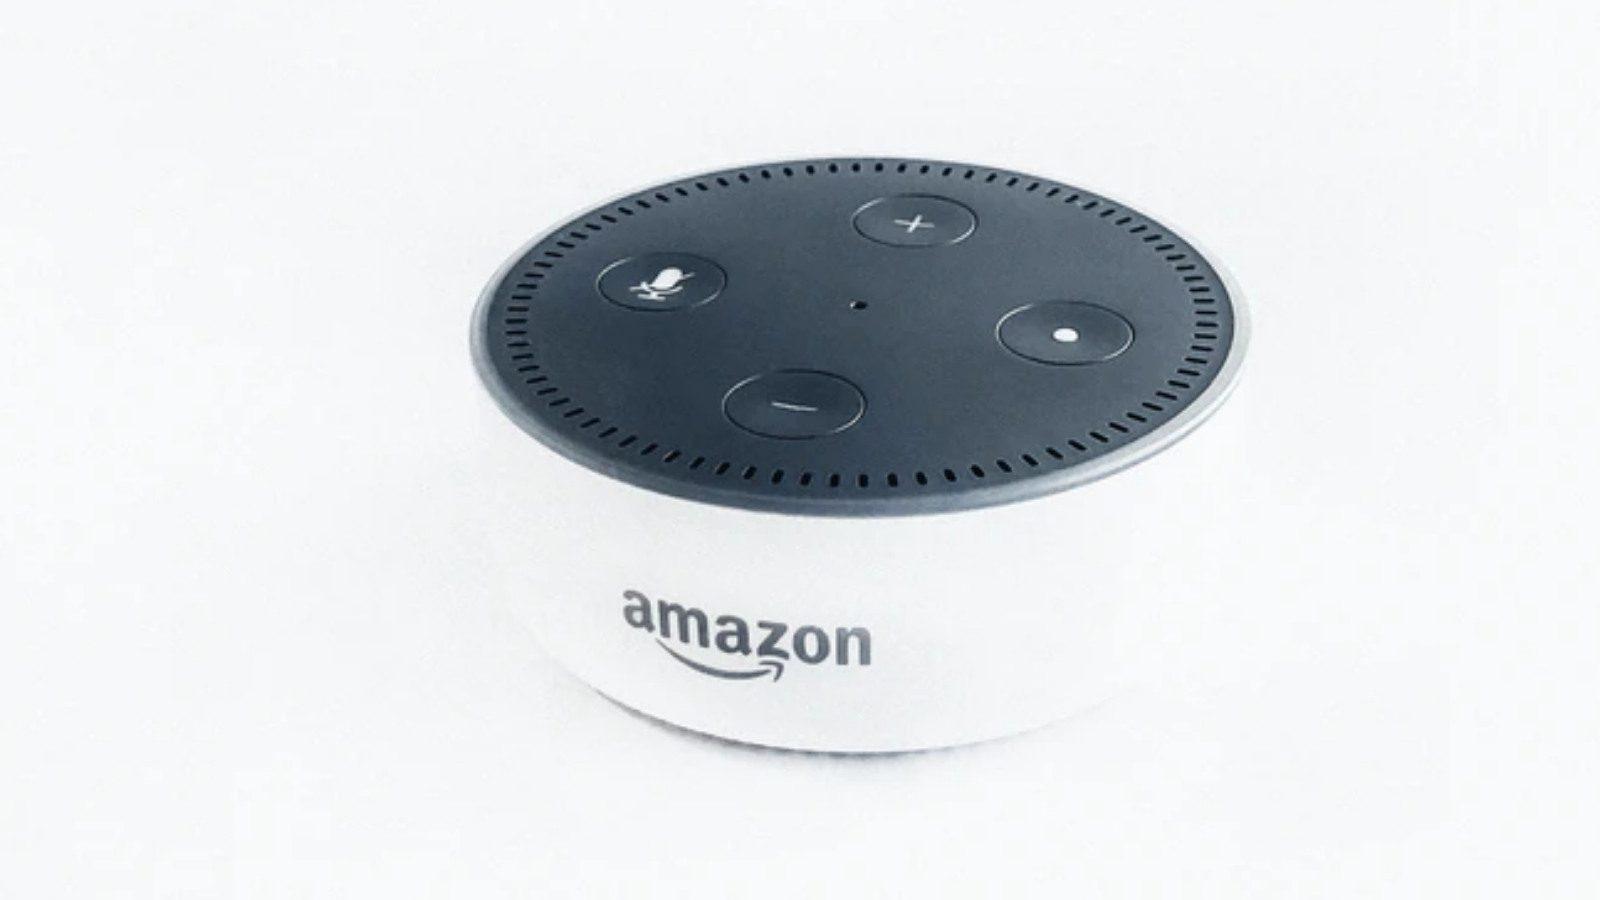 Amazon Alexa features